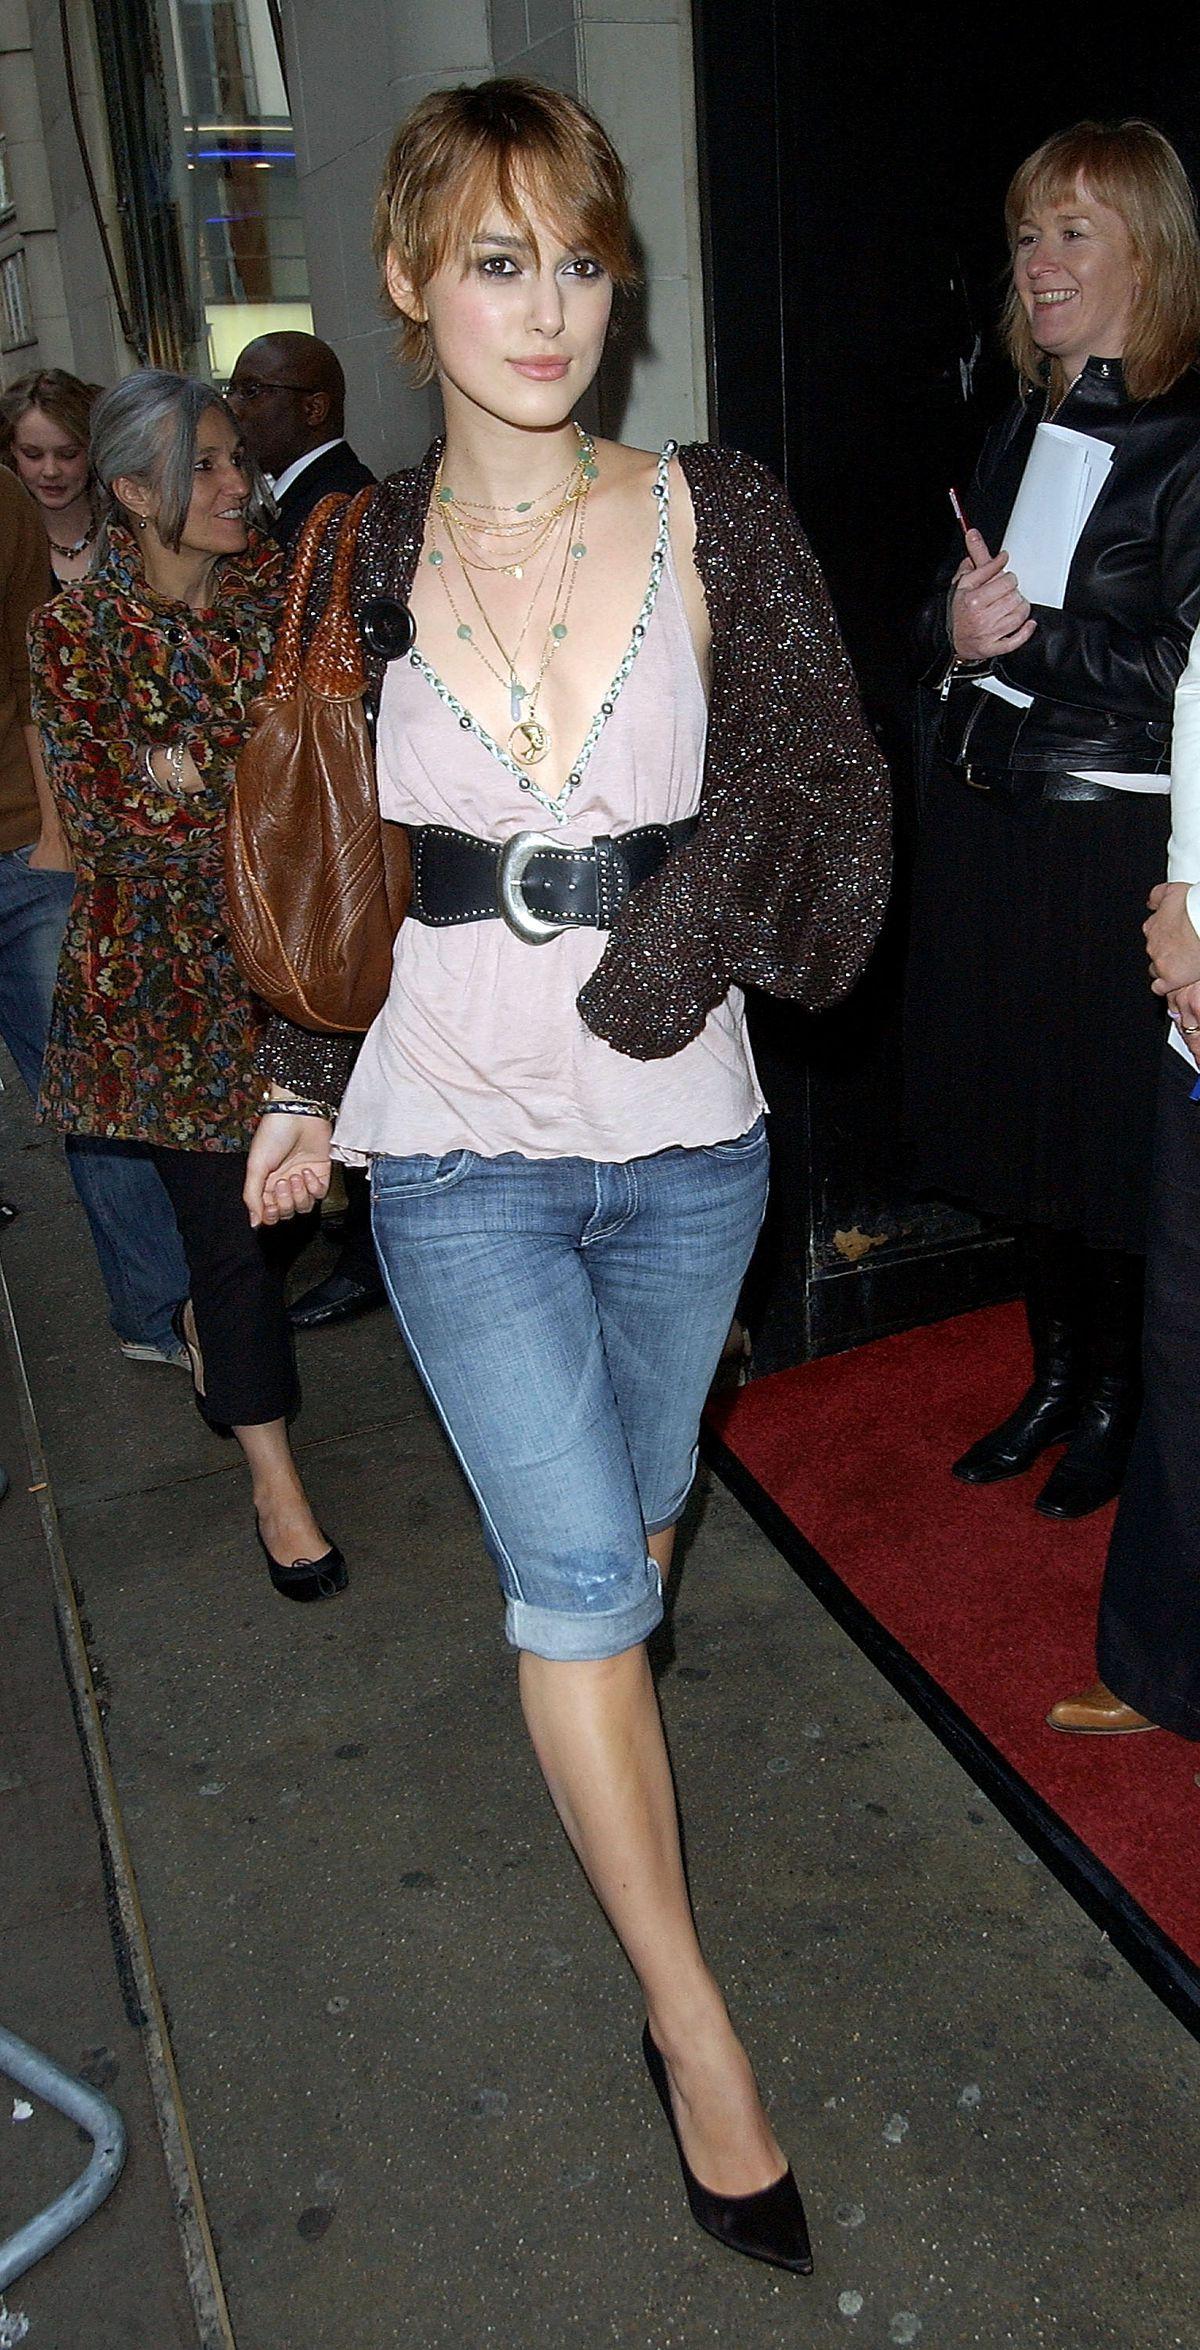 Keira Knightley wearing denim pedal pushers in 2005.